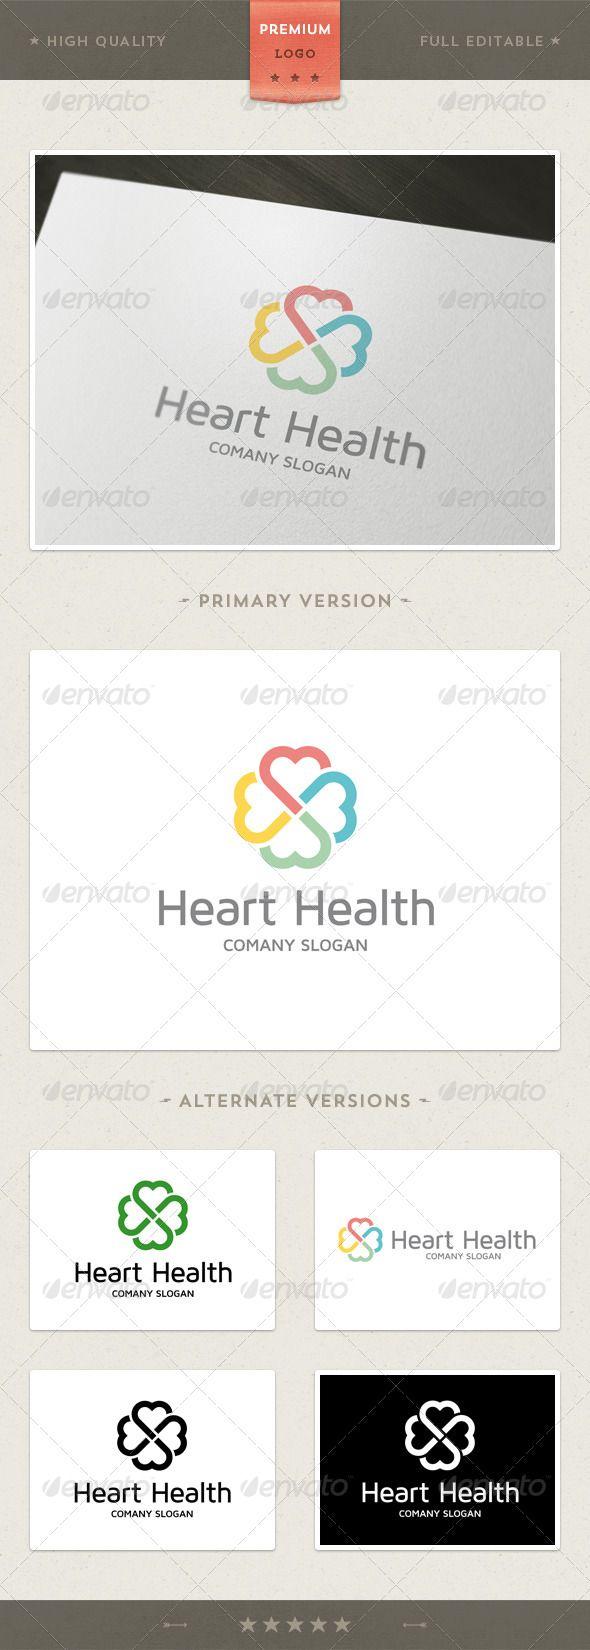 Heart Health Logo Template